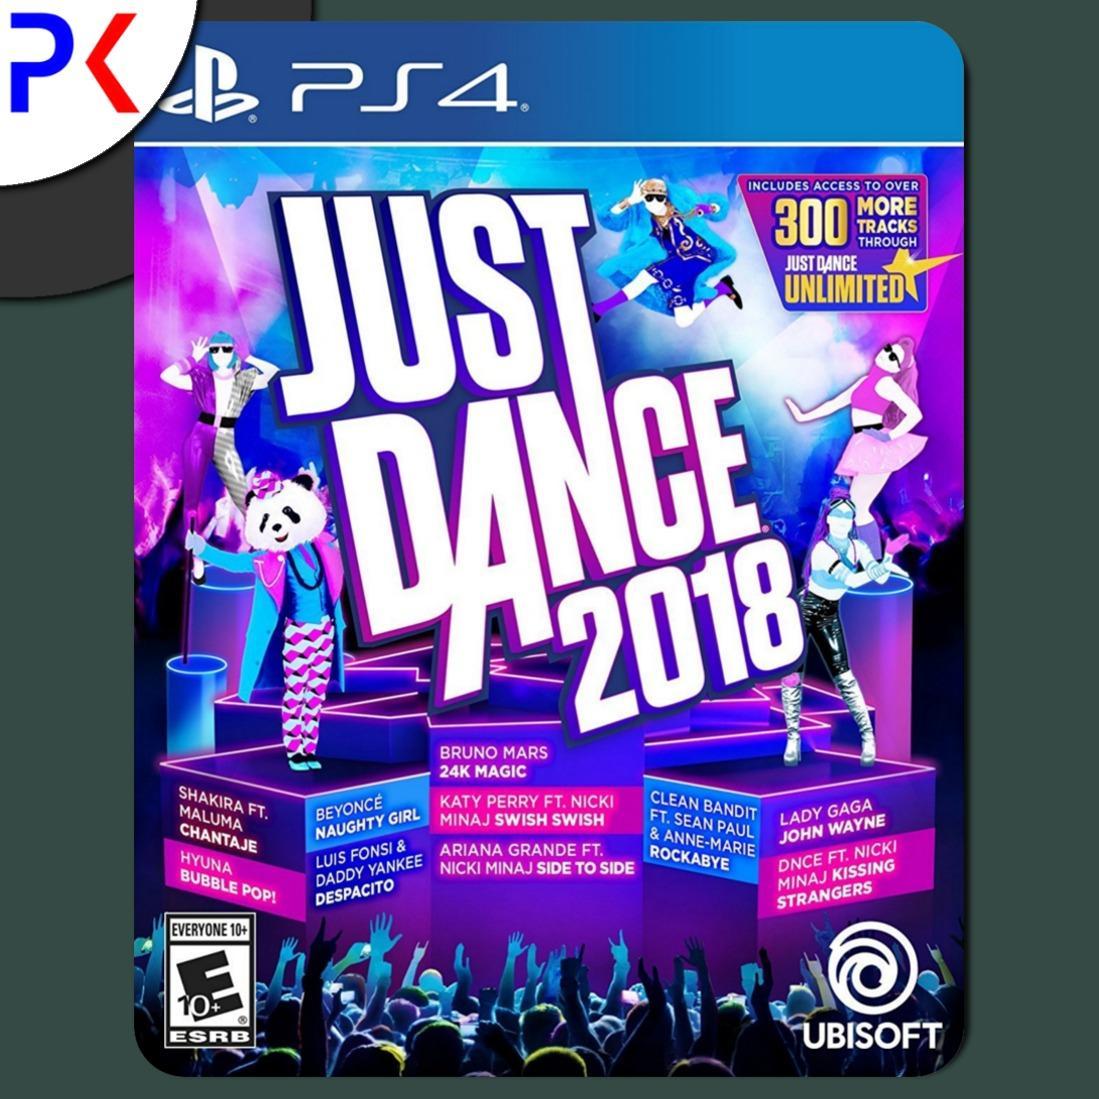 Harga Dan Spek Ps4 Mafia Iii Deluxe Edition Region 2 Hari Ini Fajar Bd Pes 2018 Pro Evolution Soccer Premium Reg Games Preorder Price In Singapore